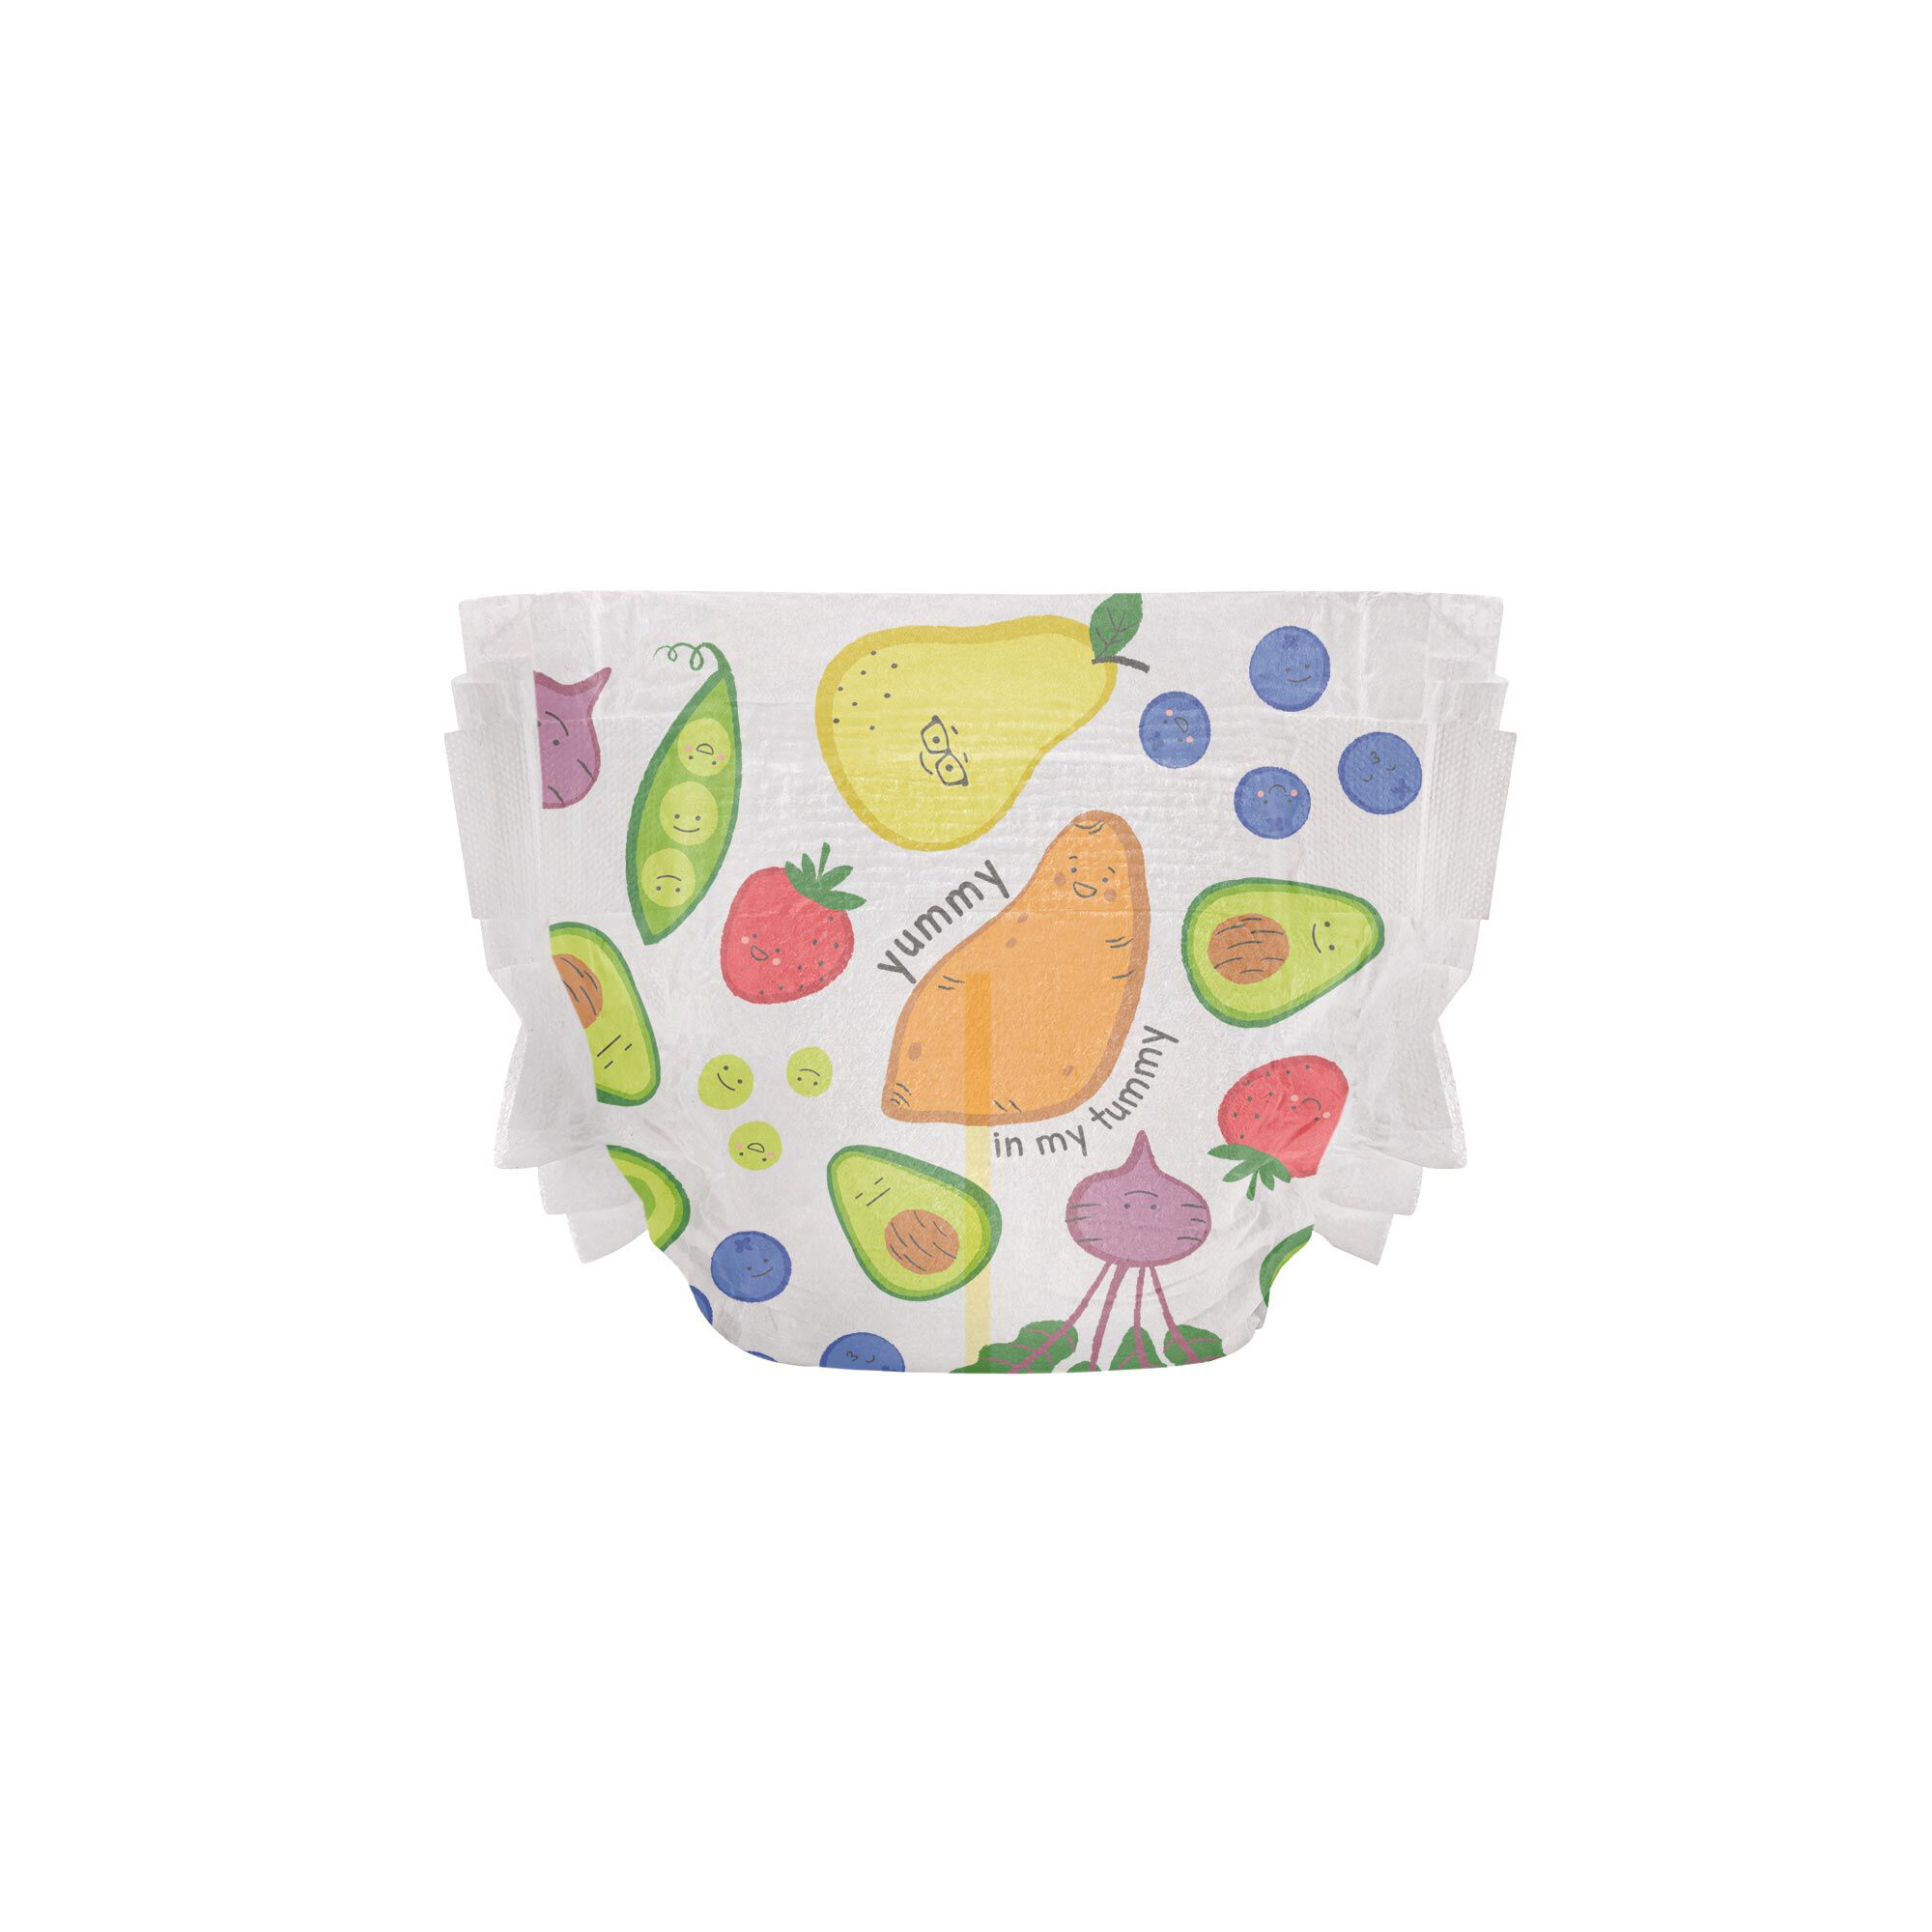 Clean Conscious Diaper, So Delish, Size 6